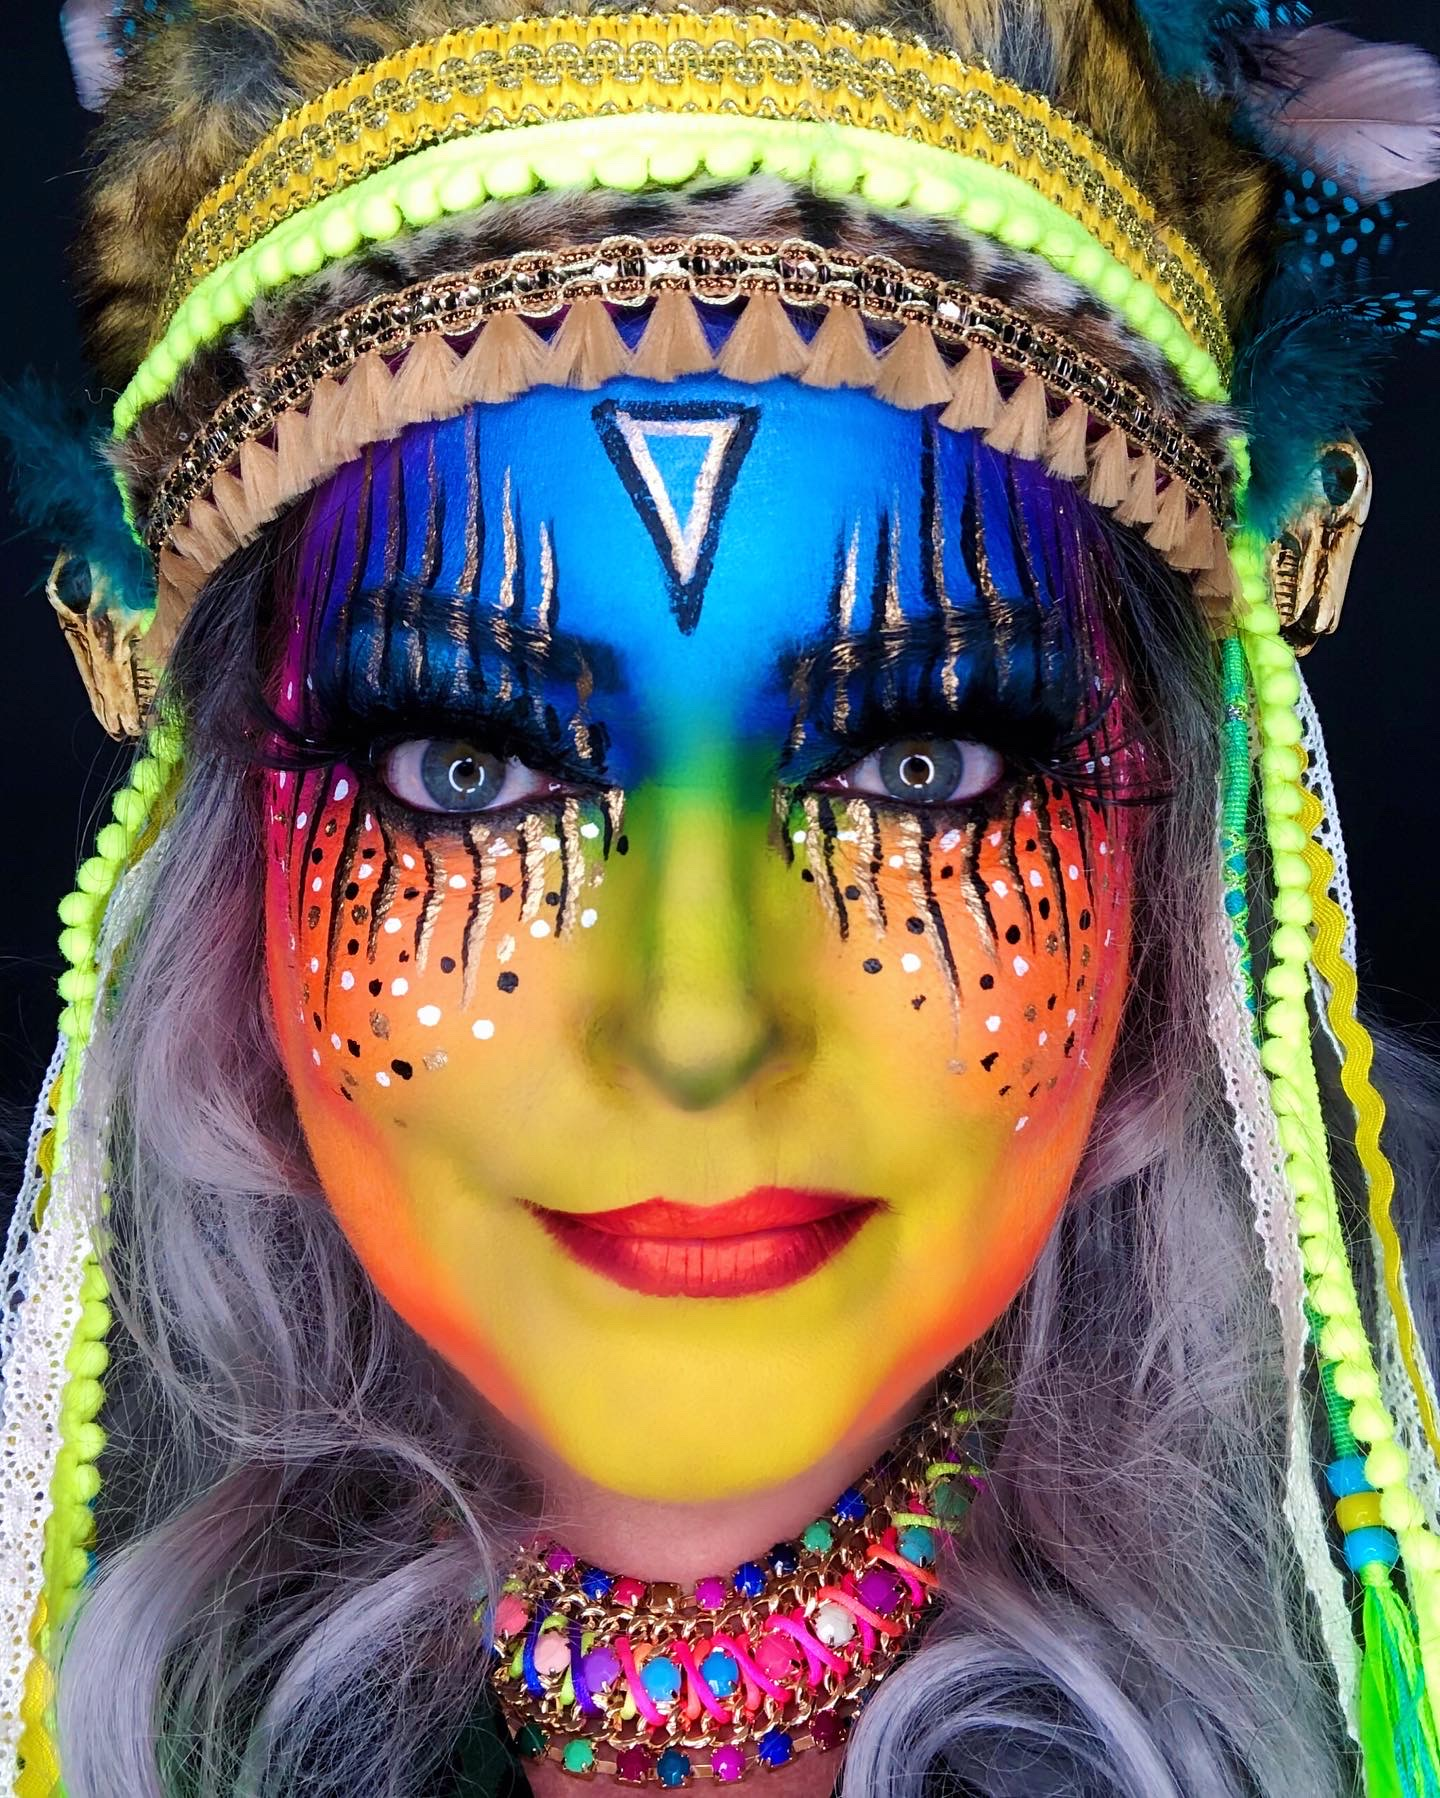 Carnaval designs